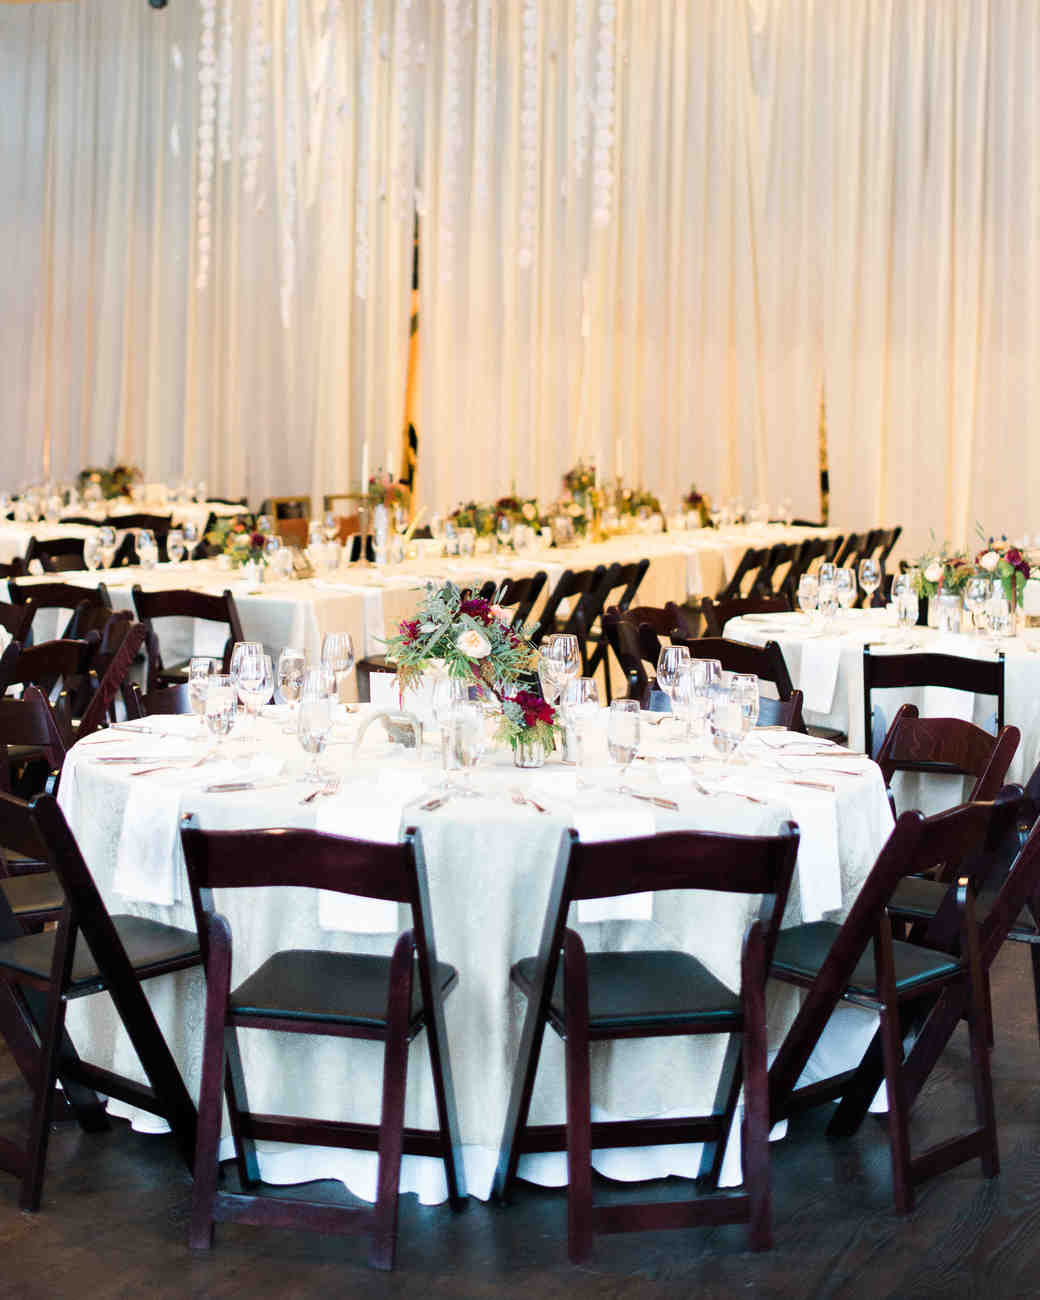 tiffany-nicholas-wedding-roundtable-125-s111339-0714.jpg